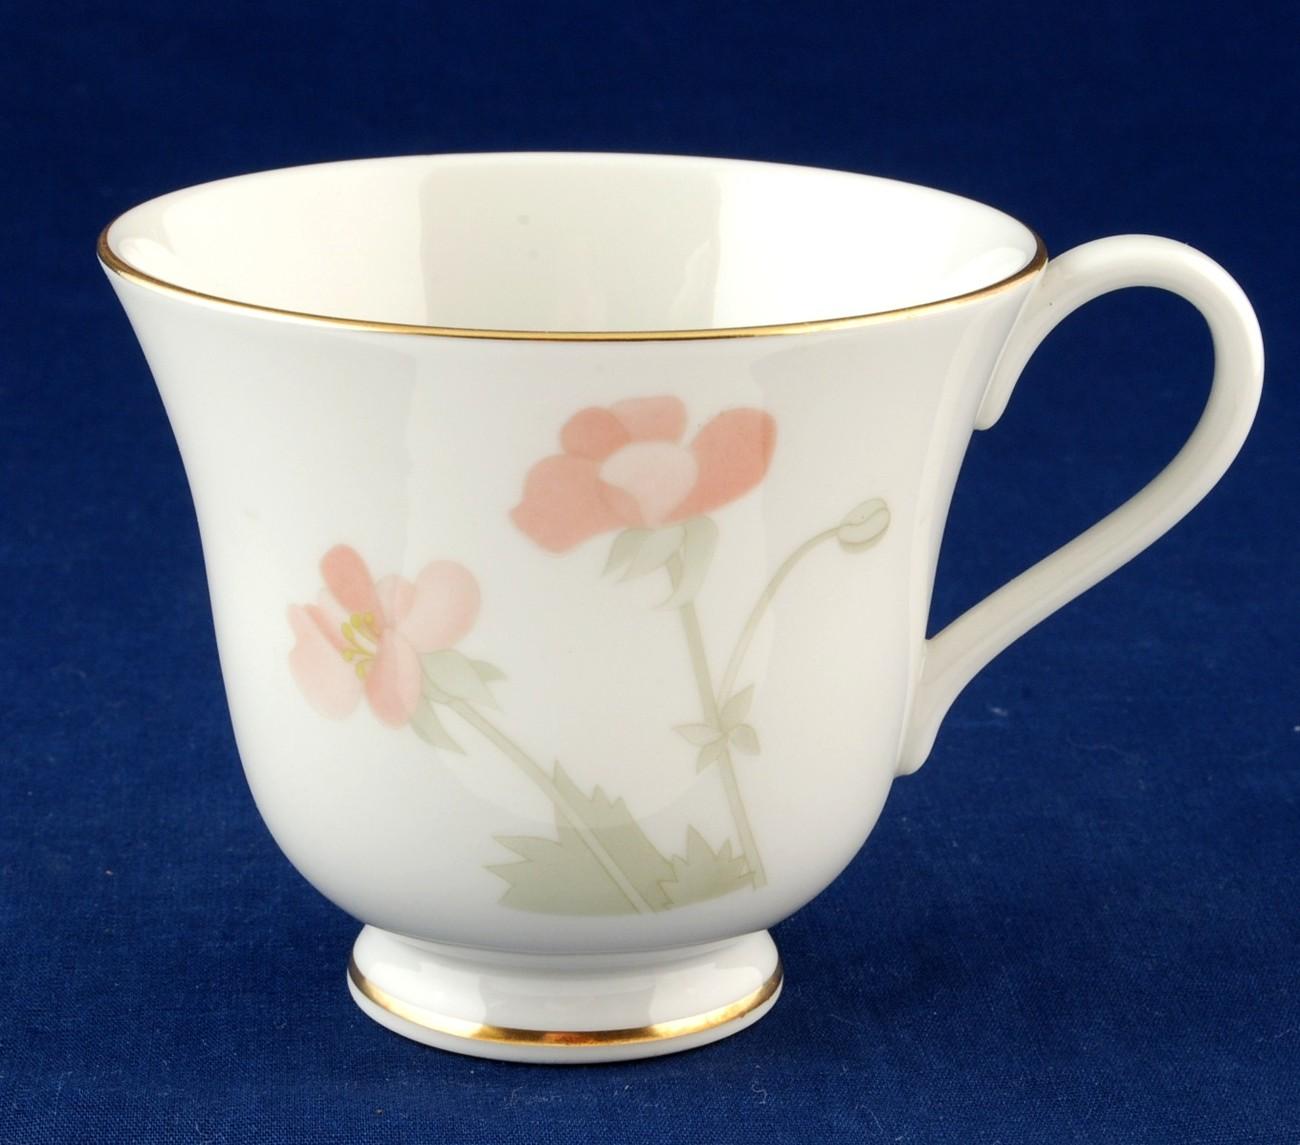 Rd harmony cup